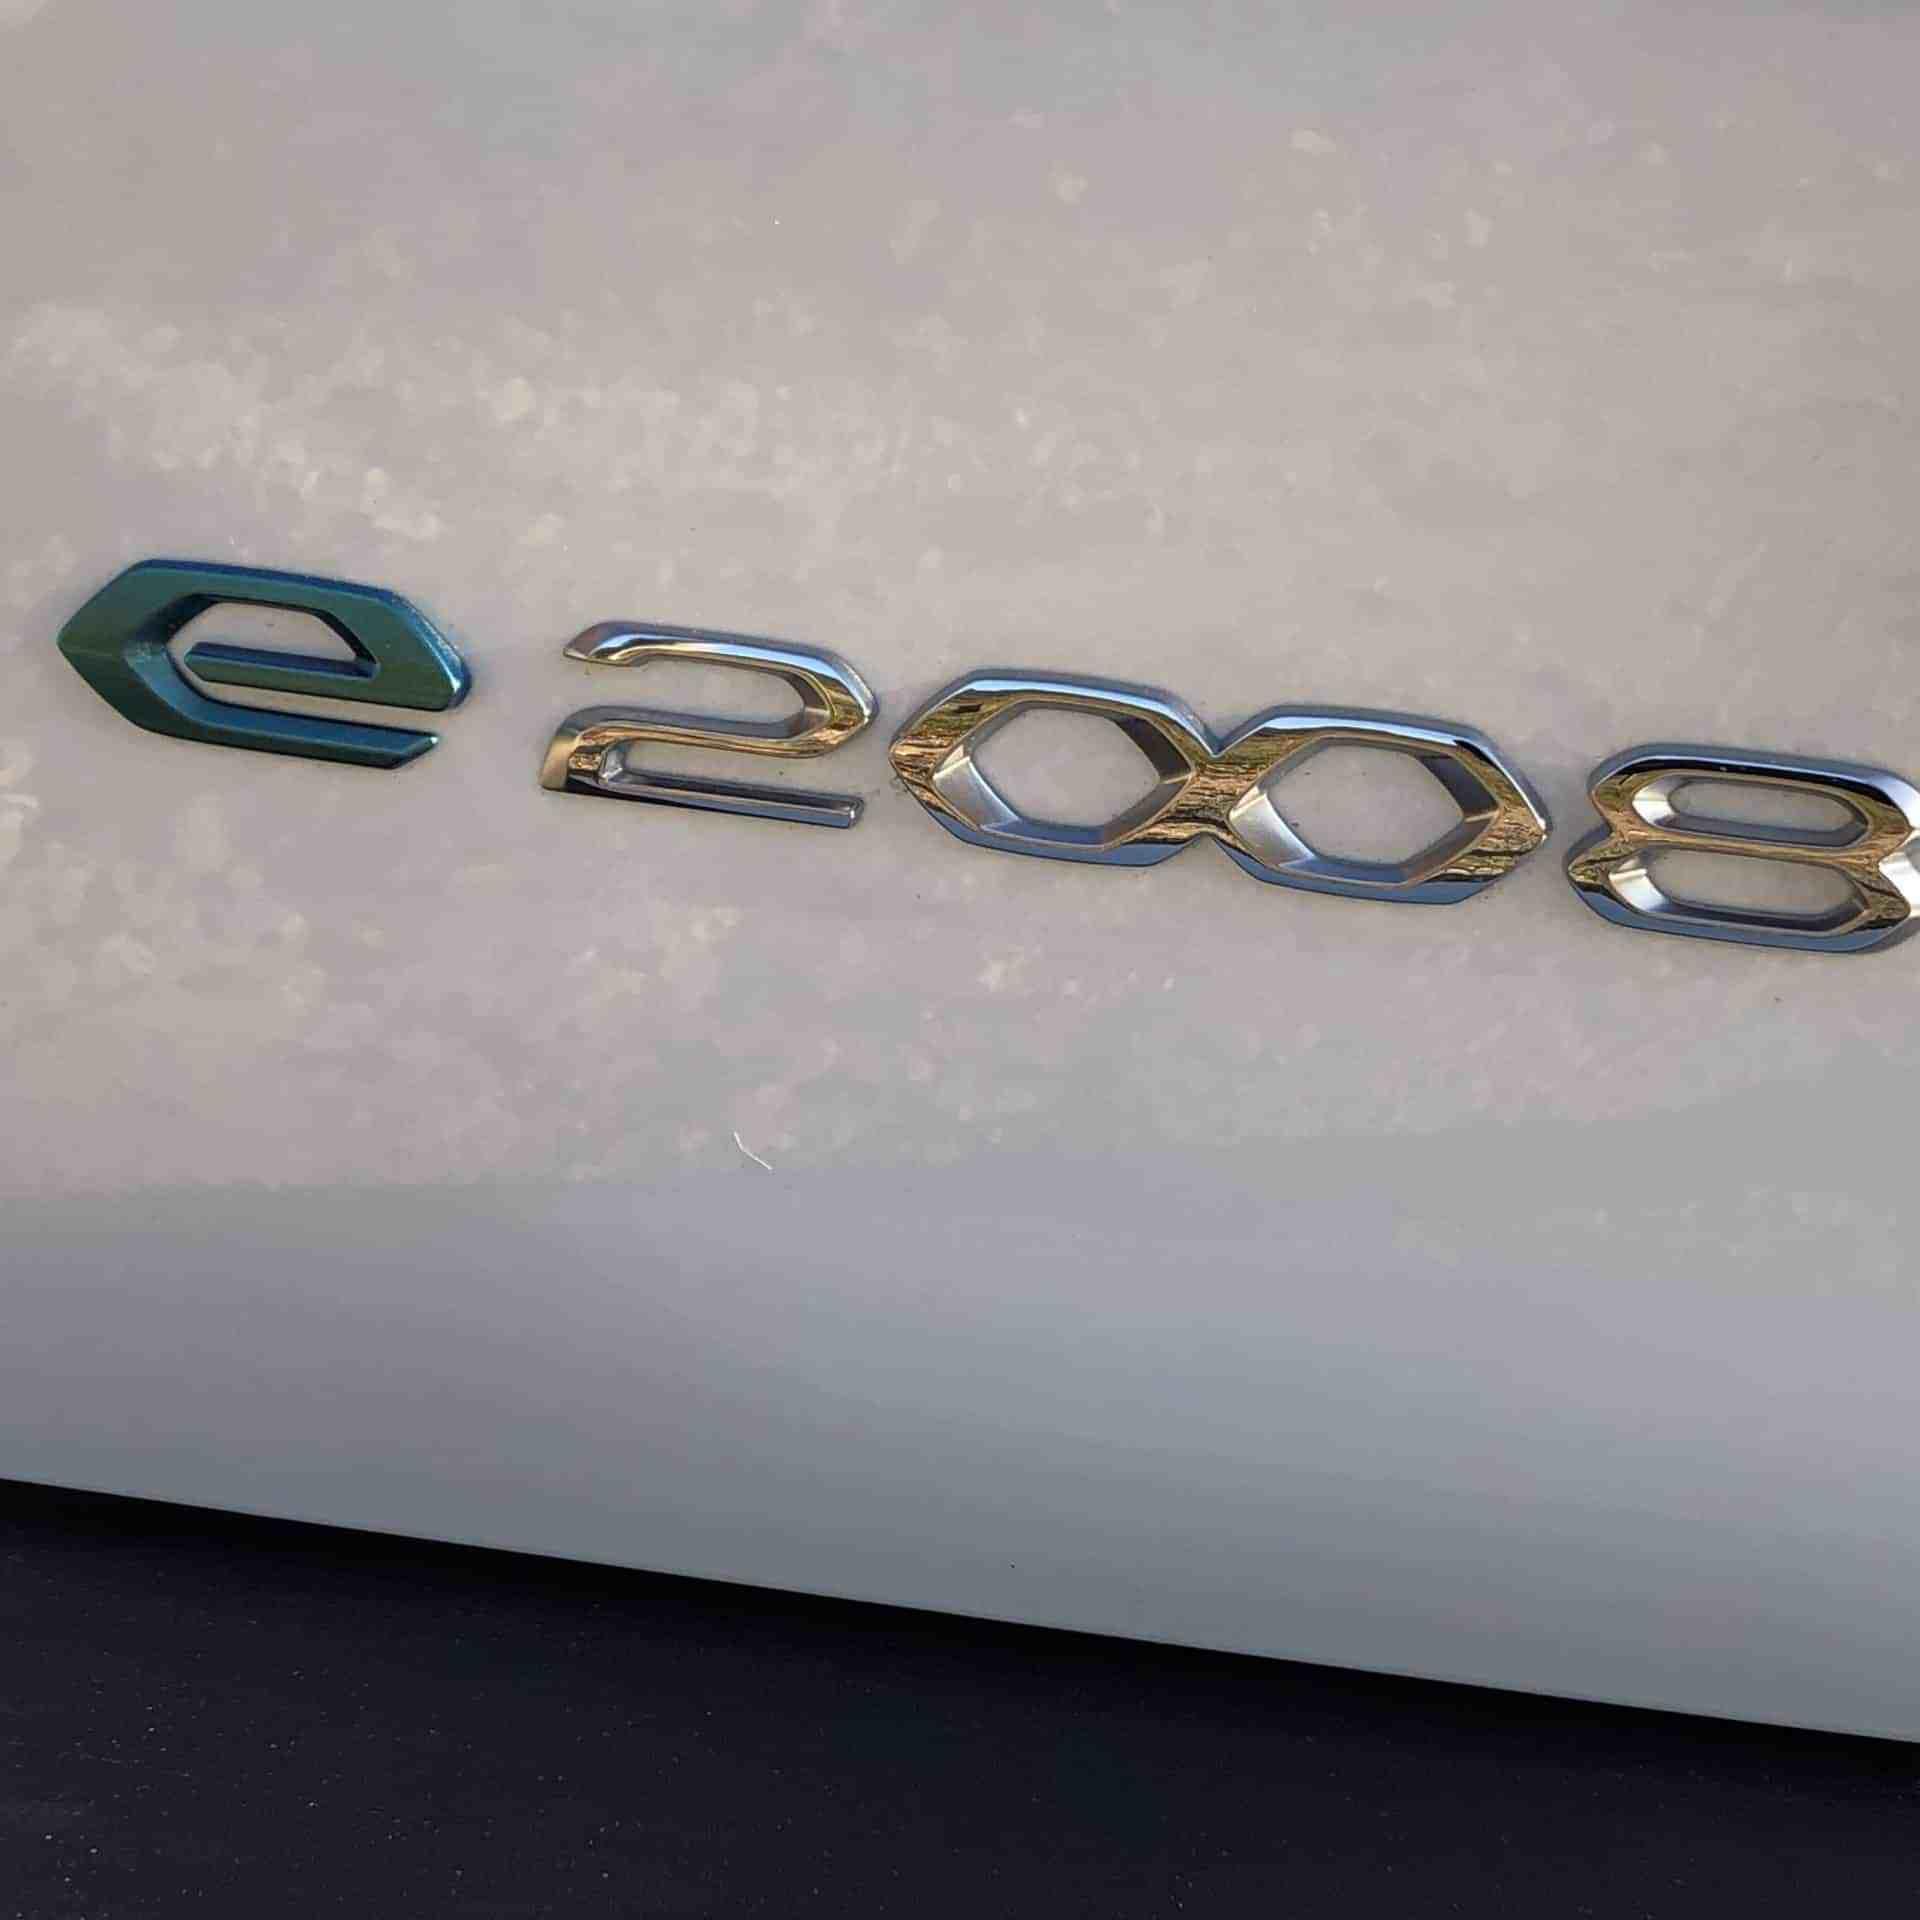 Neuer Peugeot e-2008 (136 PS)